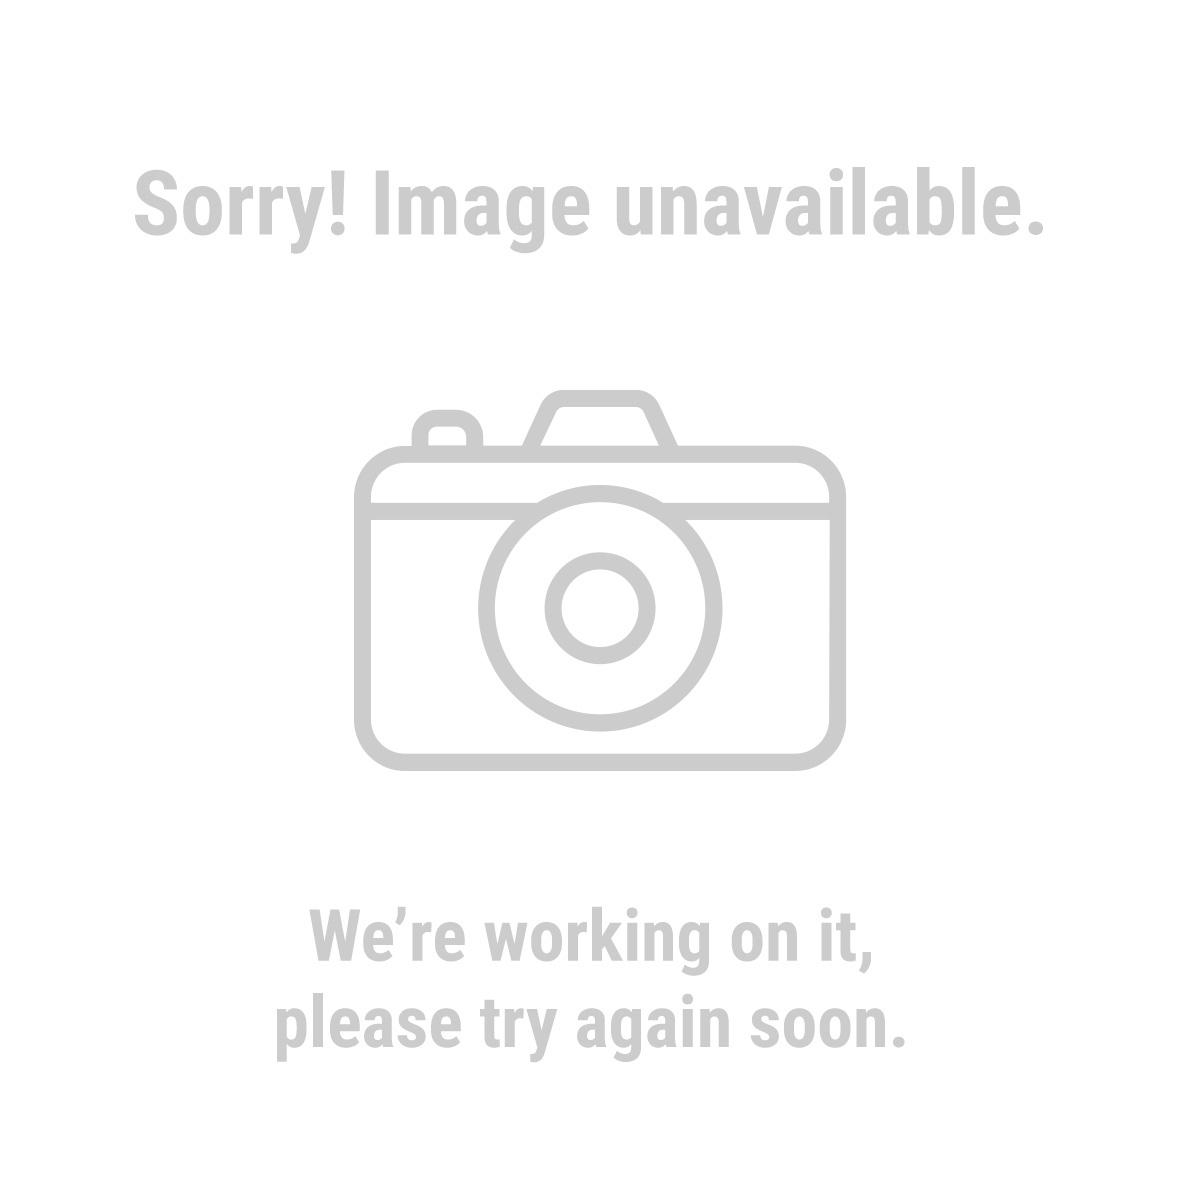 Drill Master 68242 18 Volt Cordless Jig Saw